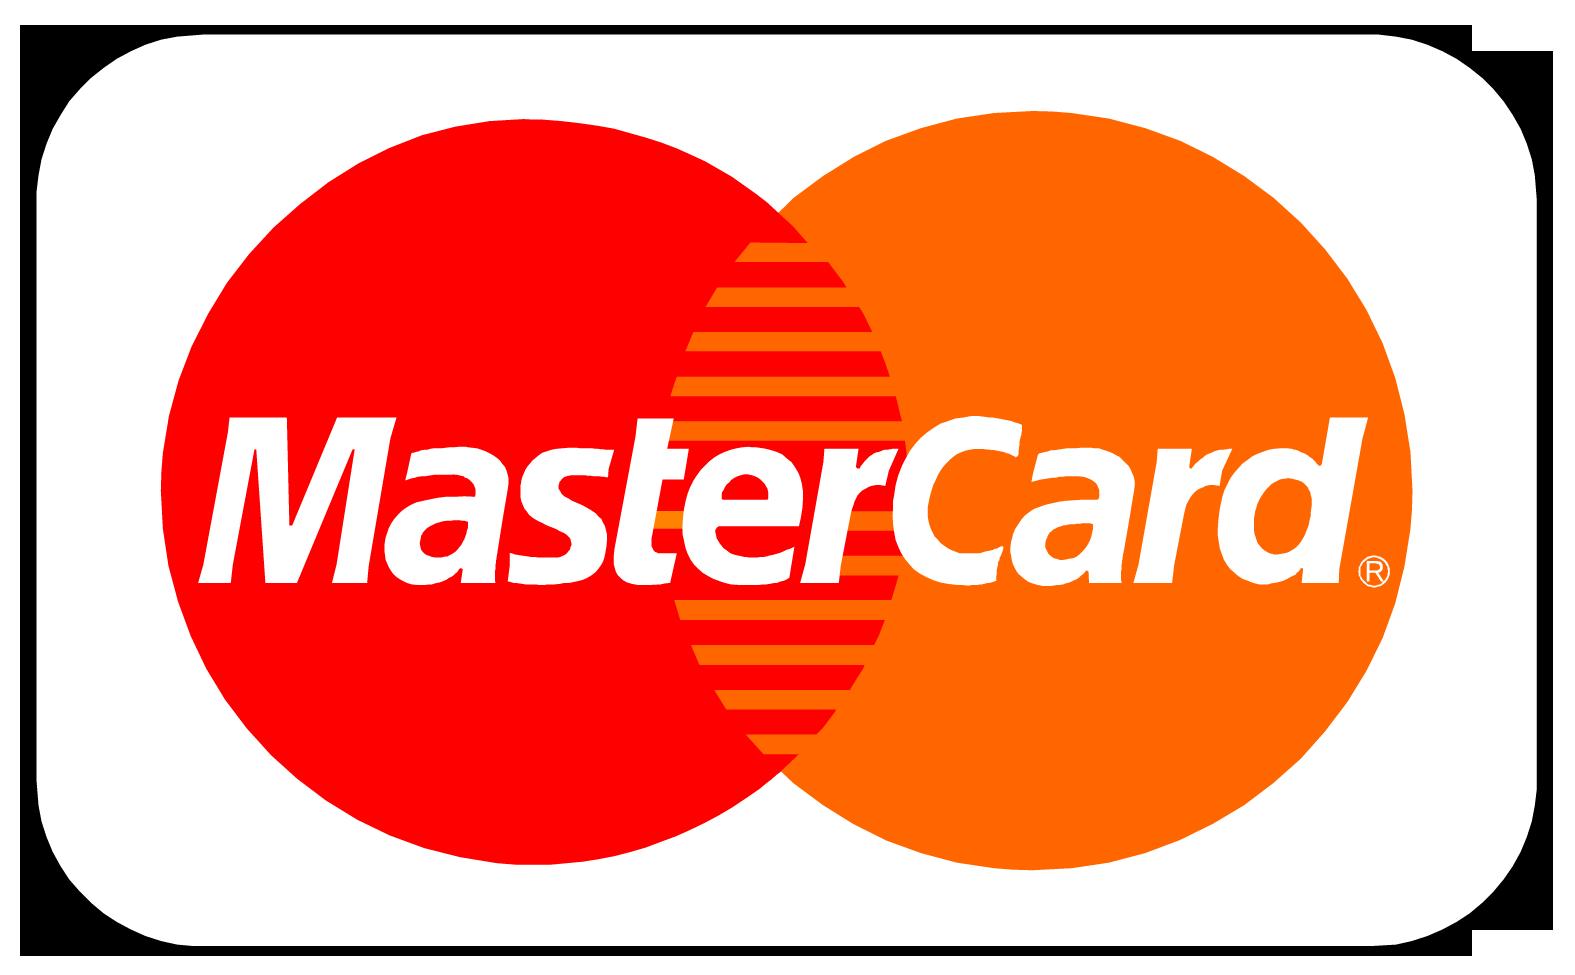 Mastercard logo PNG images free download.